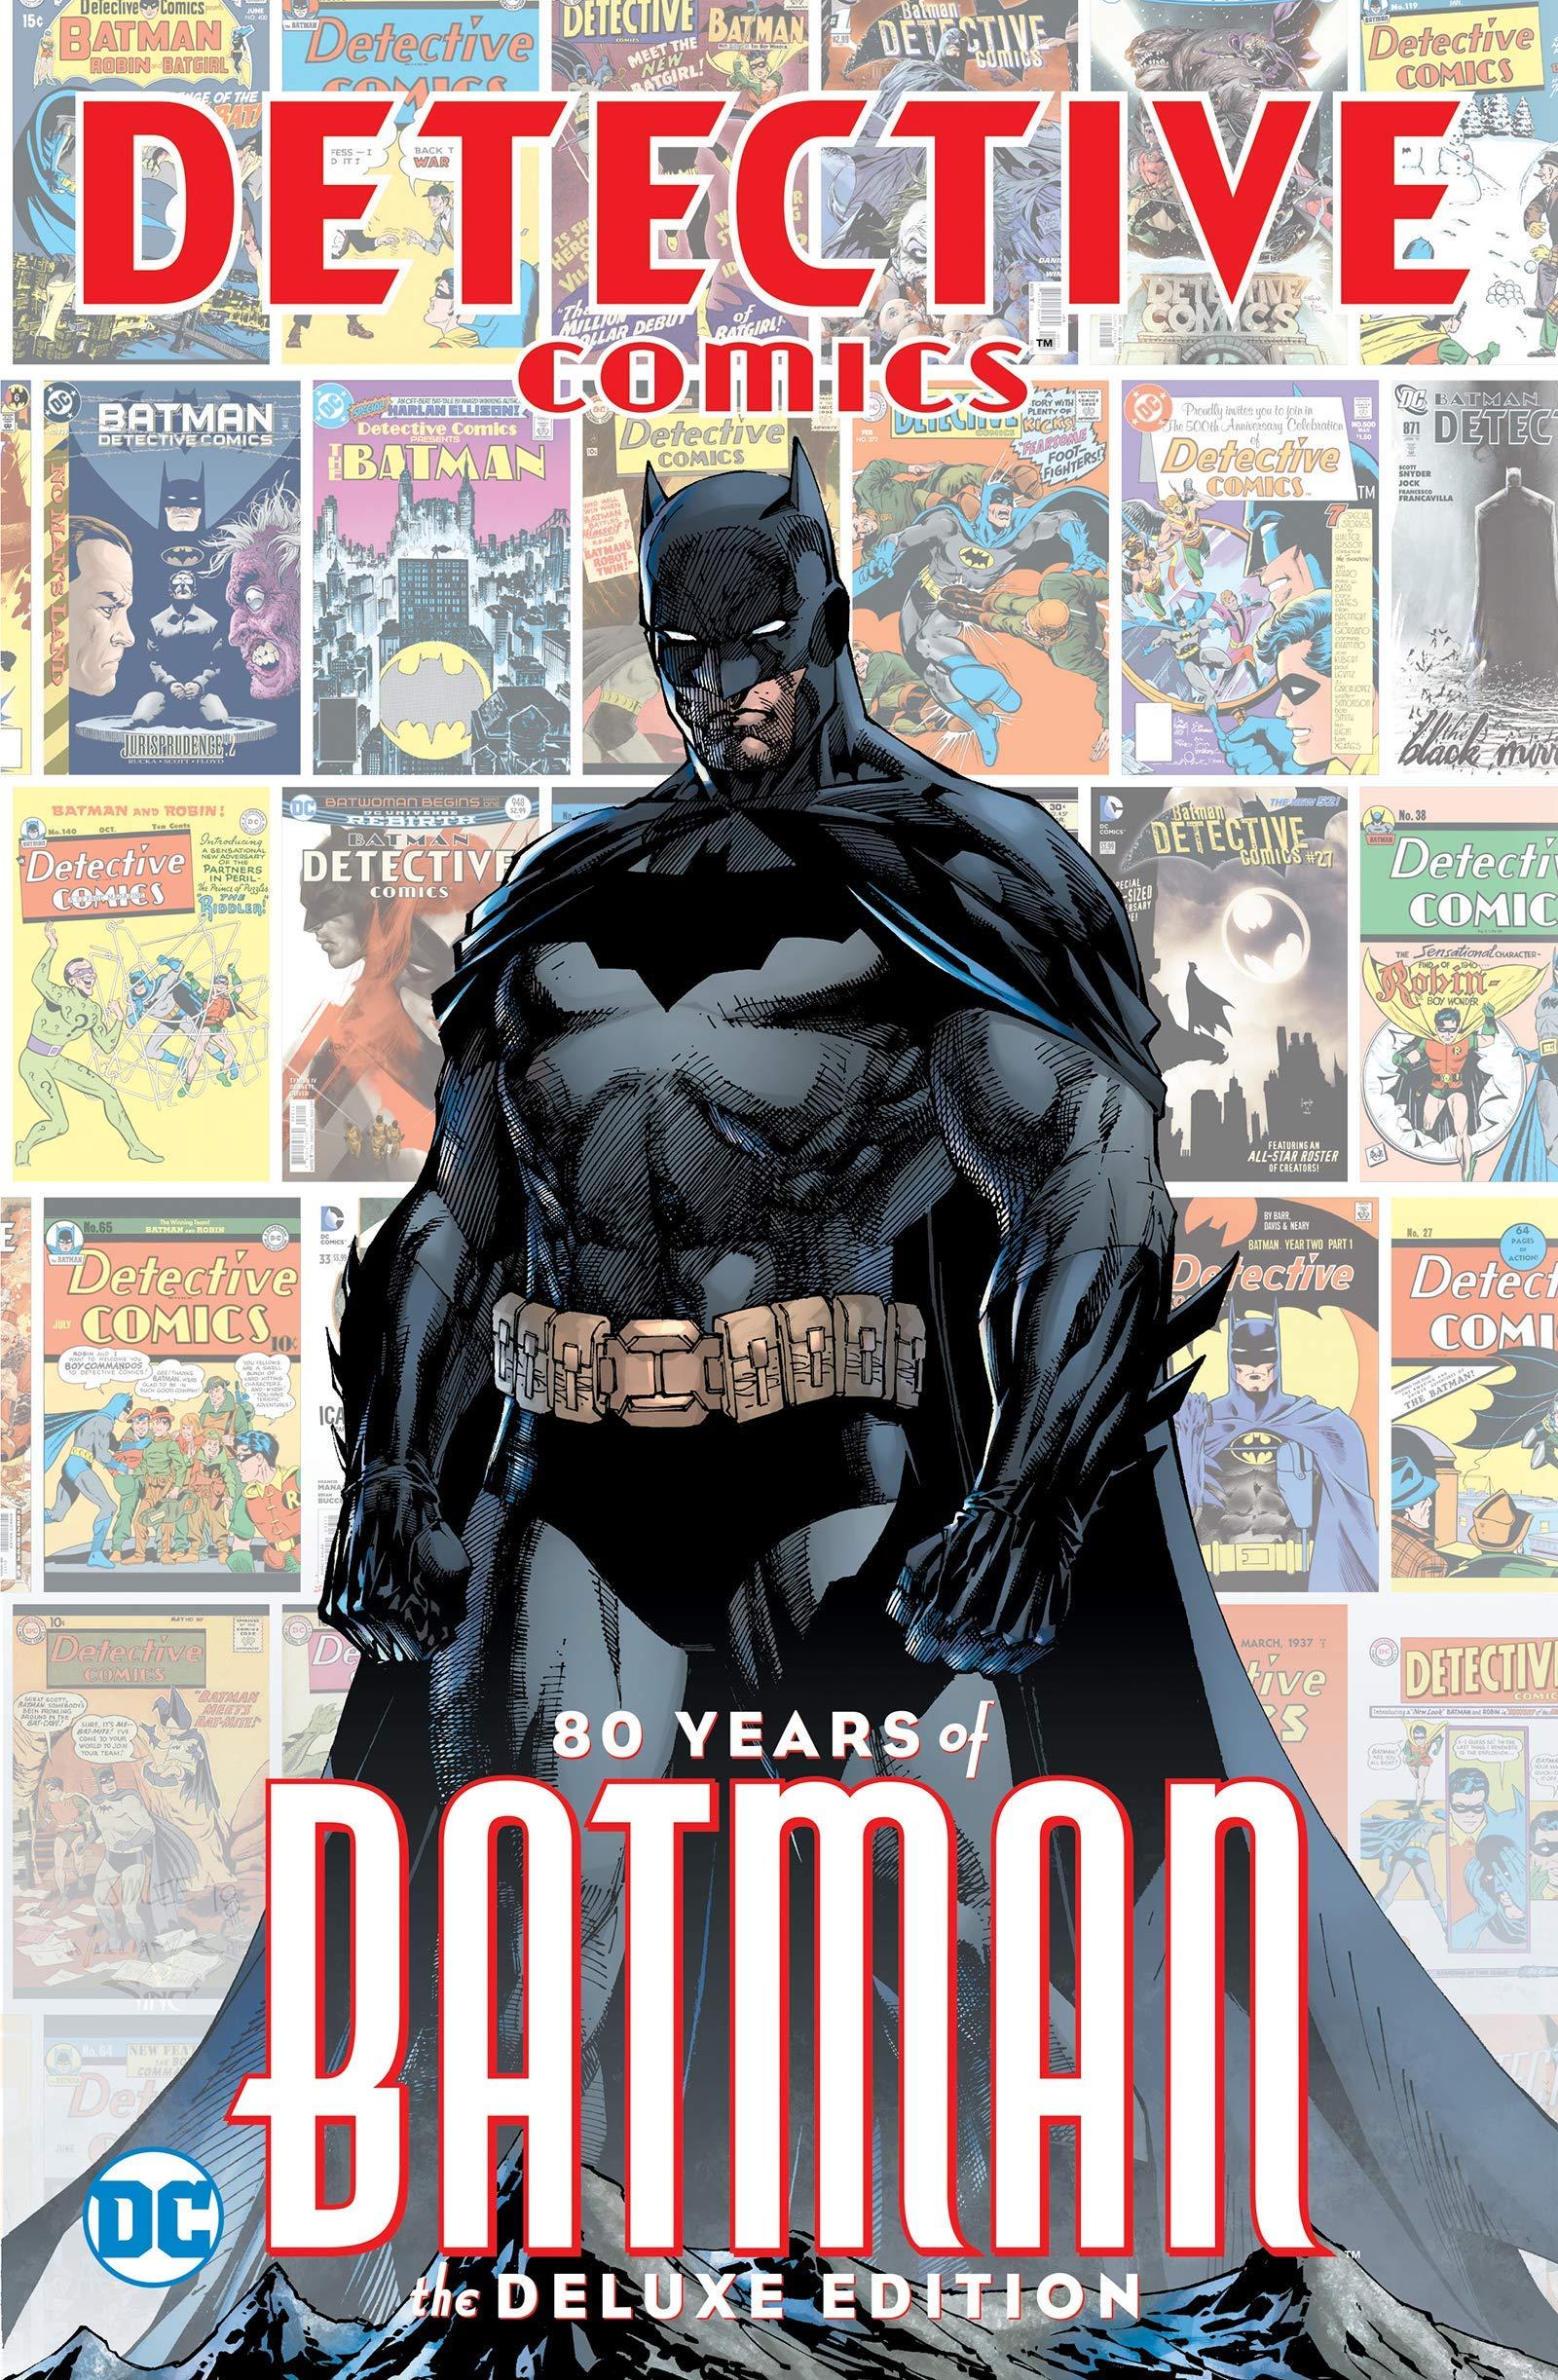 Batman 80 ans 1 - Detective Comics : 80 years of Batman Deluxe Edition